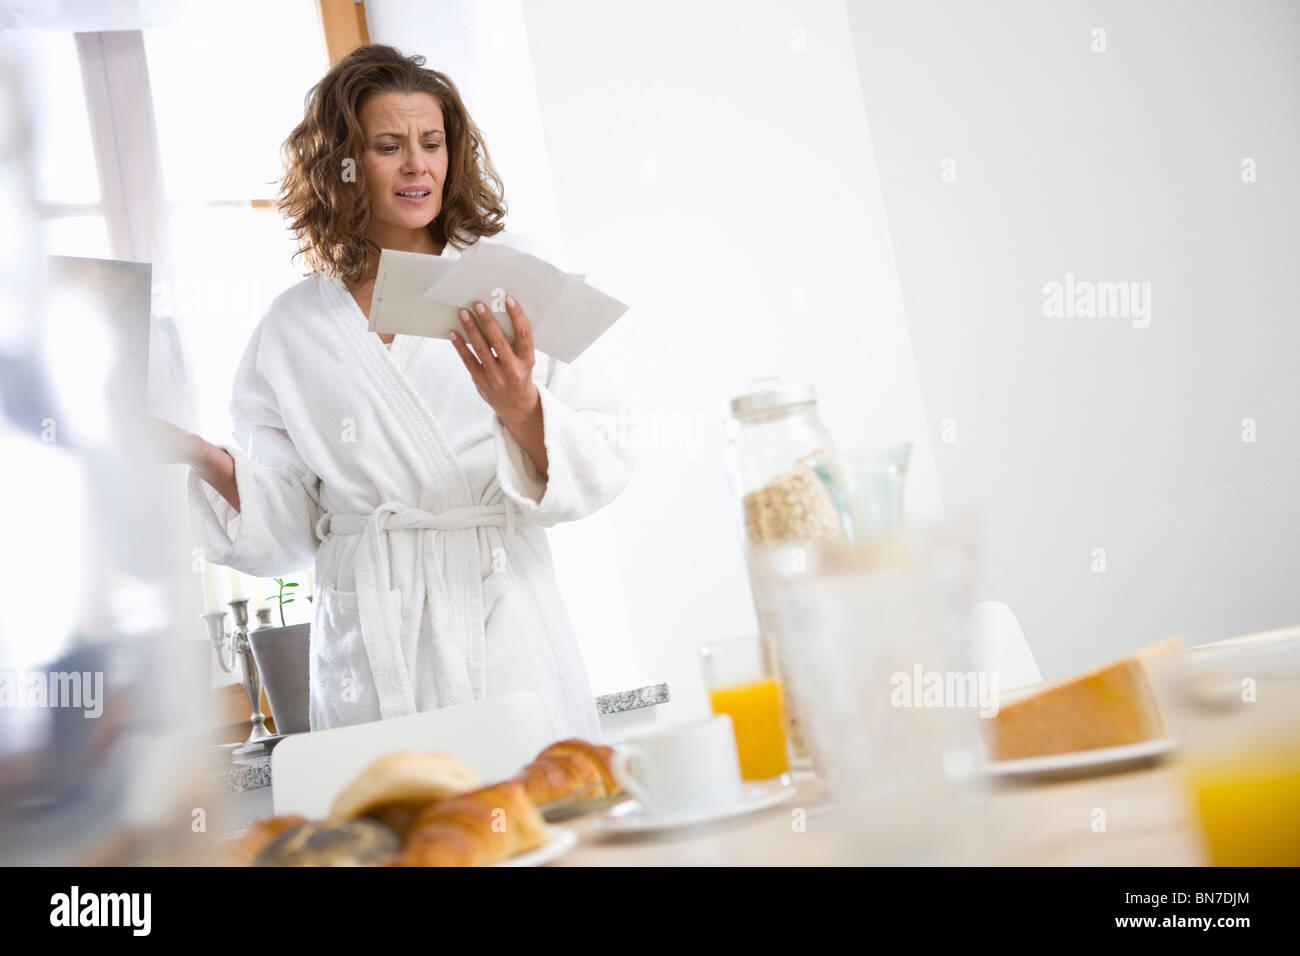 Woman getting bad news - Stock Image